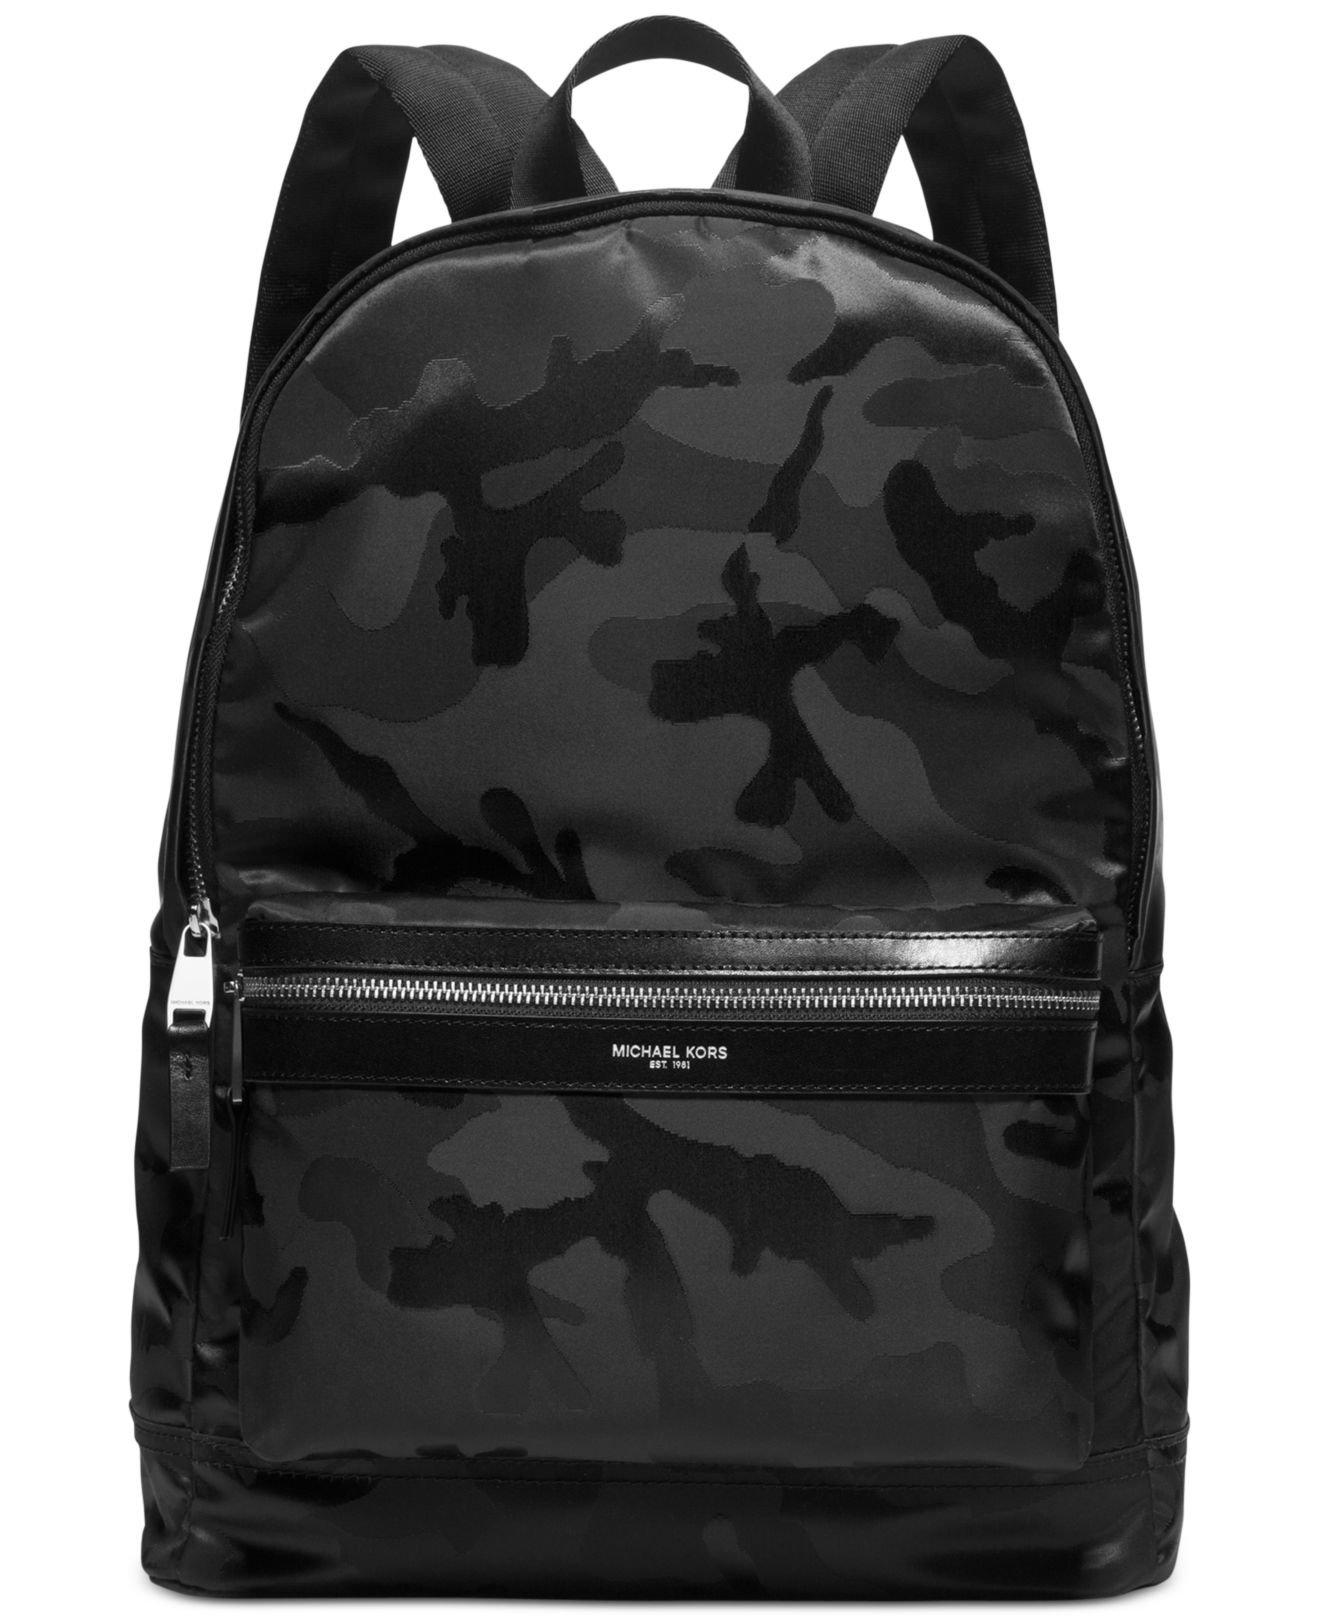 6f294830bb Lyst - Michael Kors Kent Camo Backpack in Black for Men